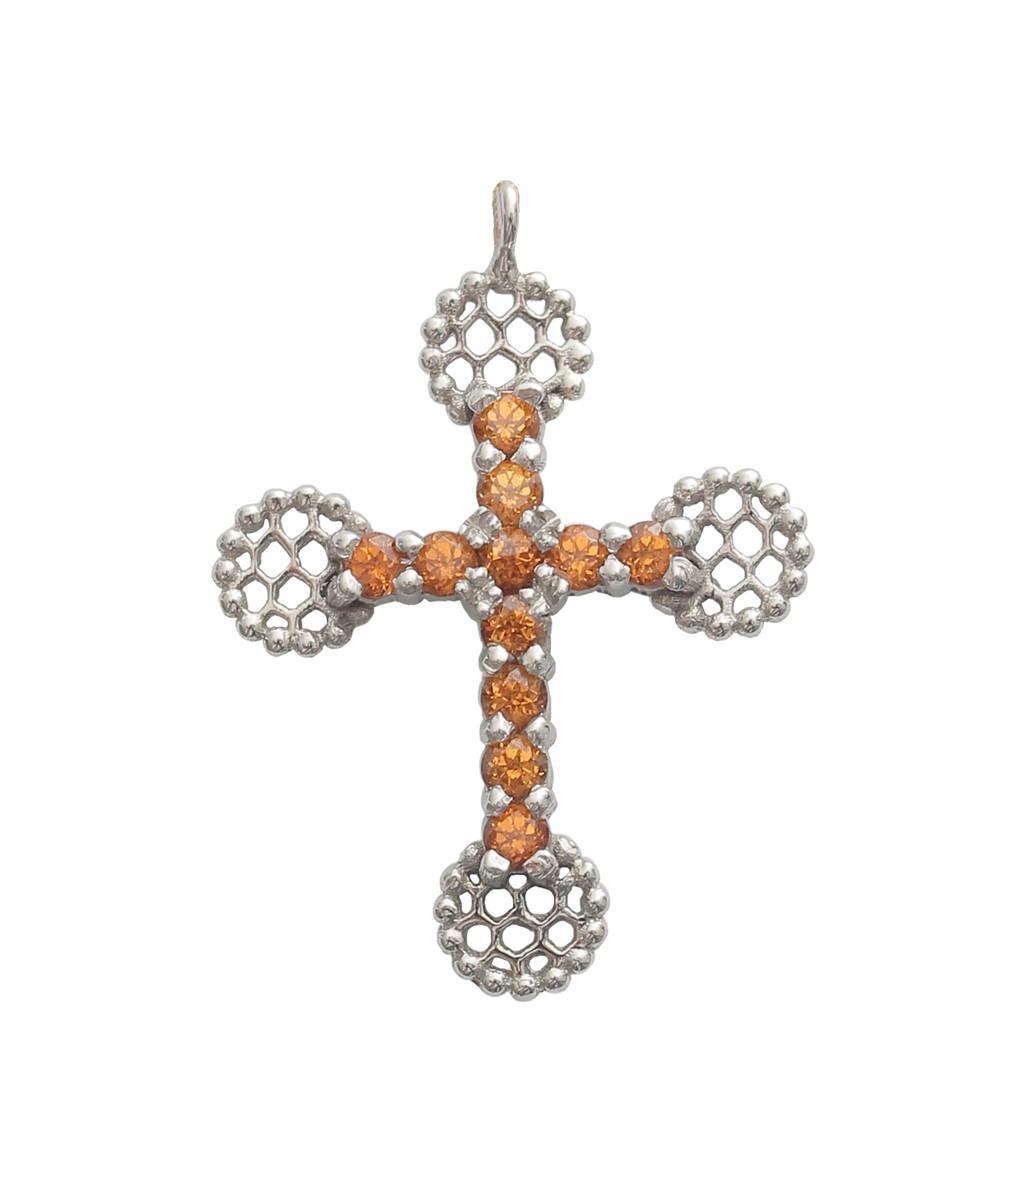 Pendentif Croix Romane - Gigi Clozeau